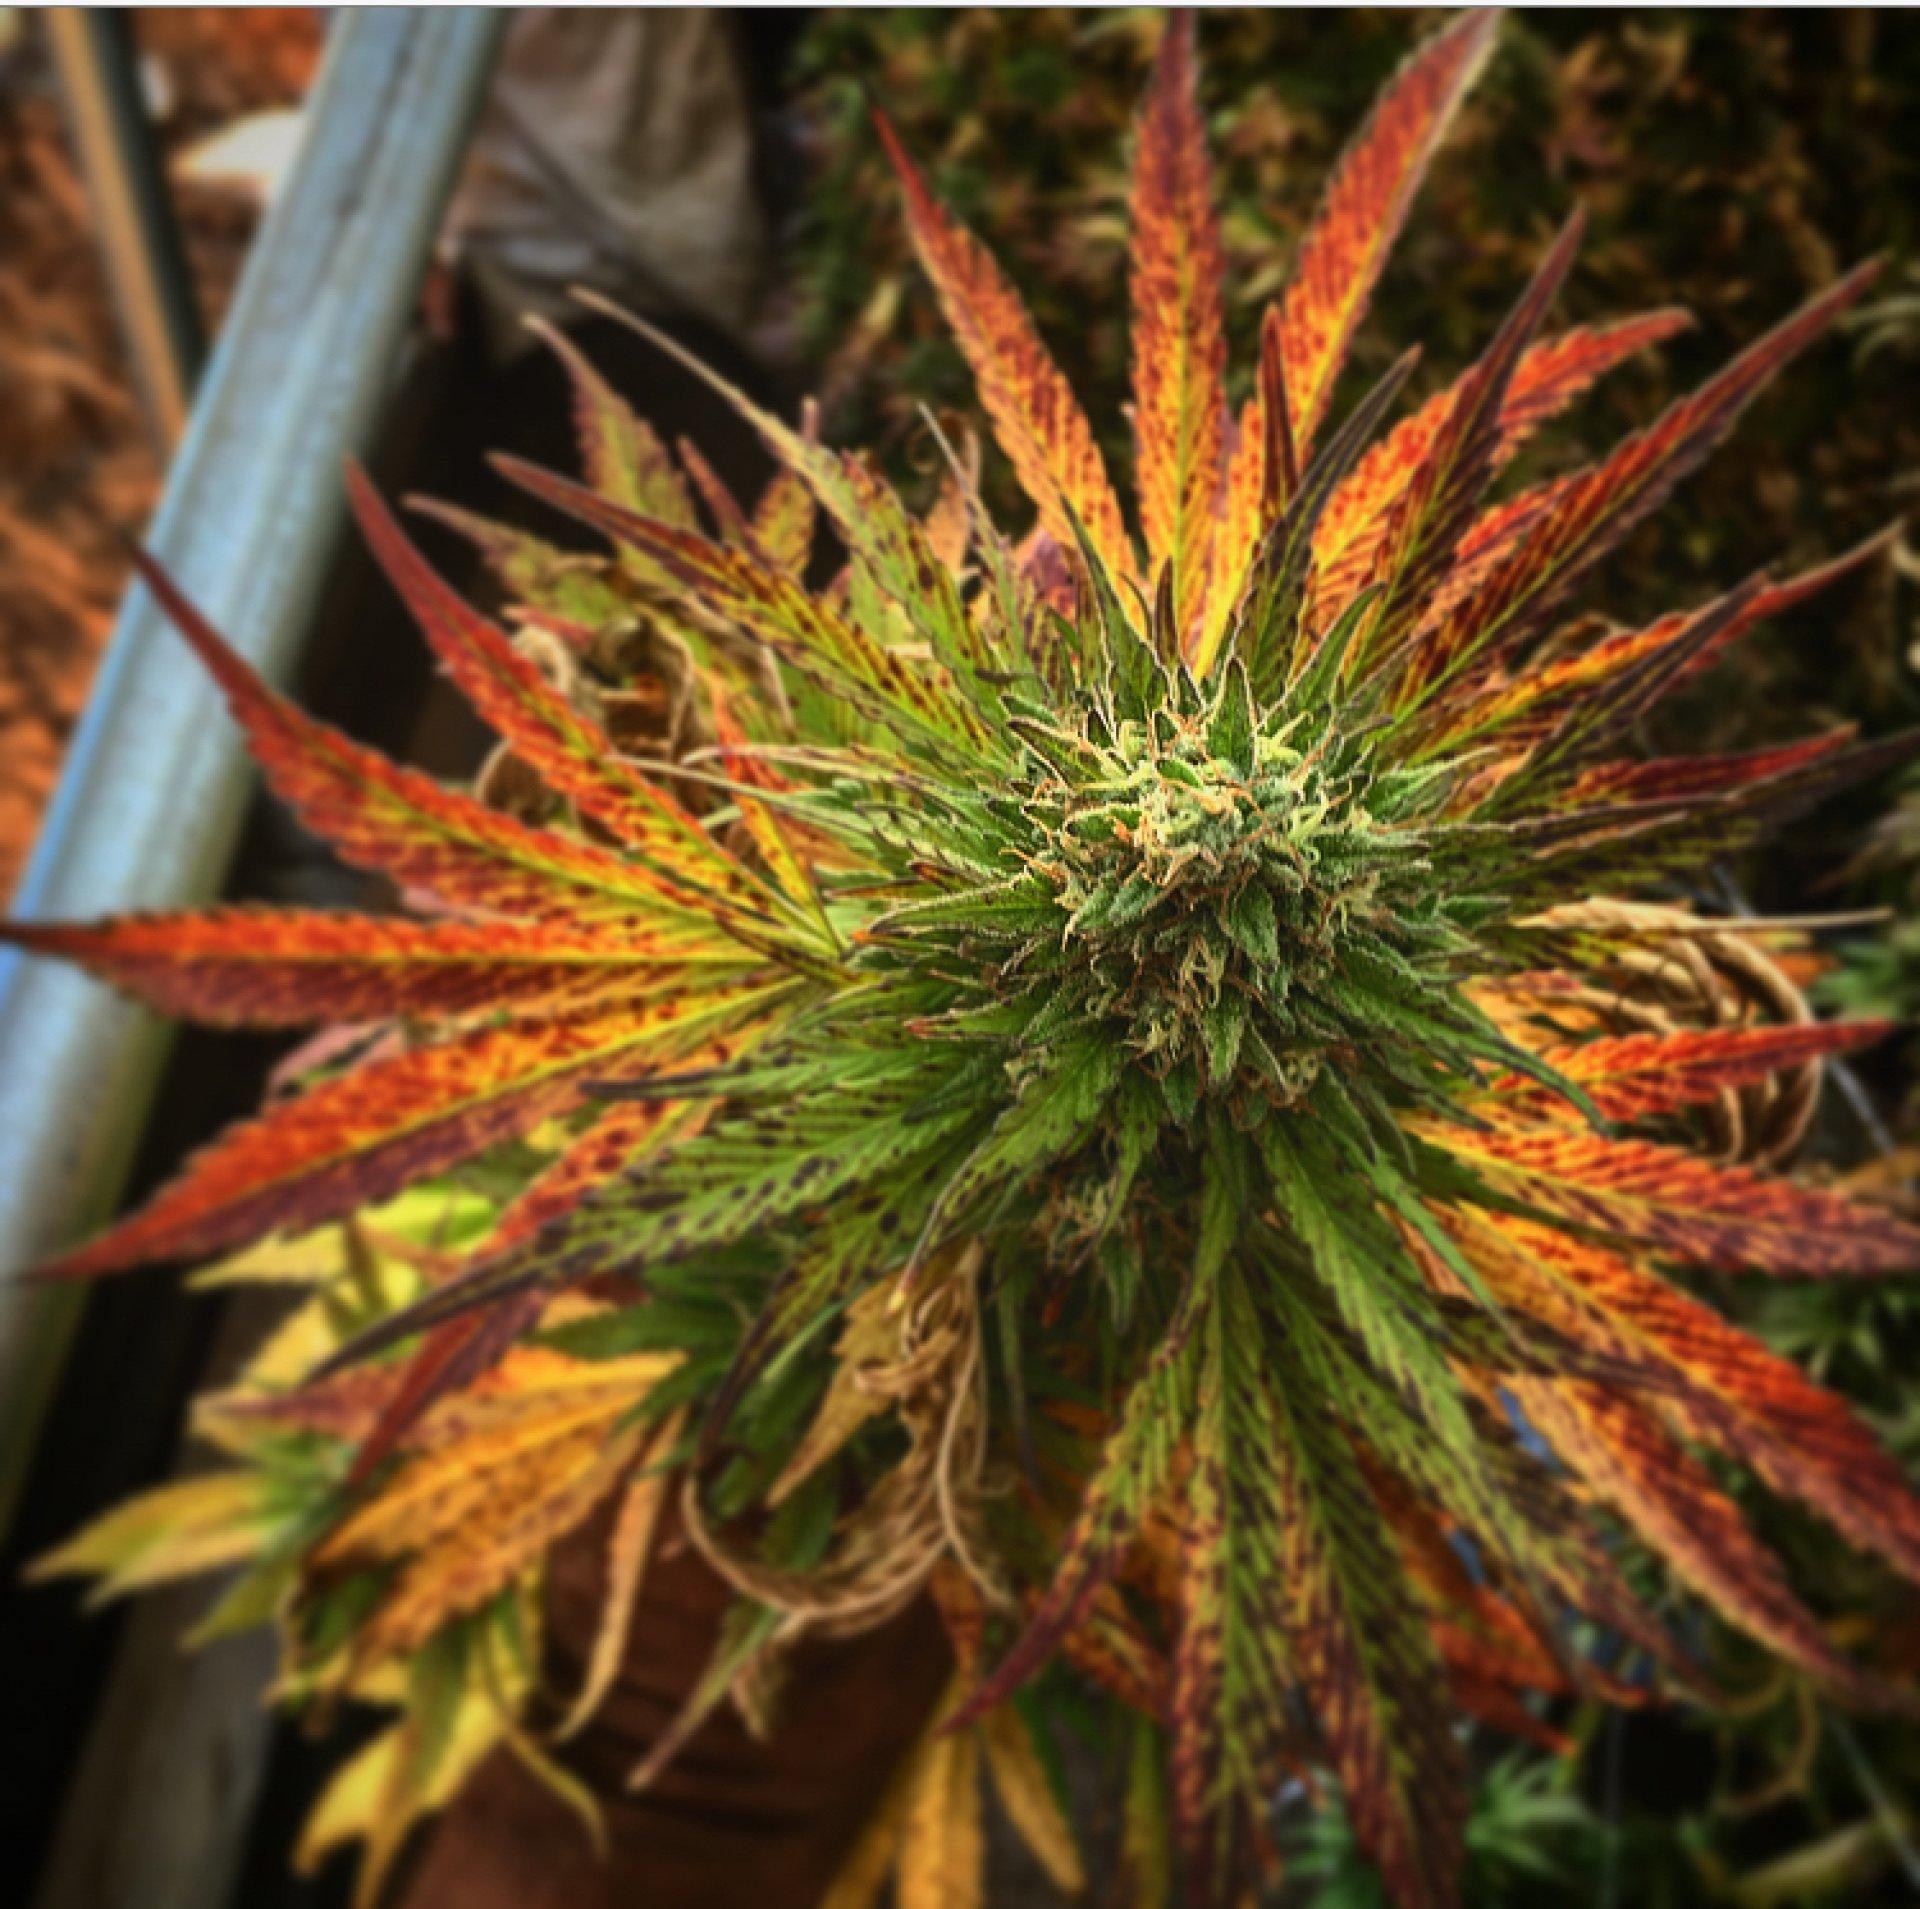 A fresh marijuana plant